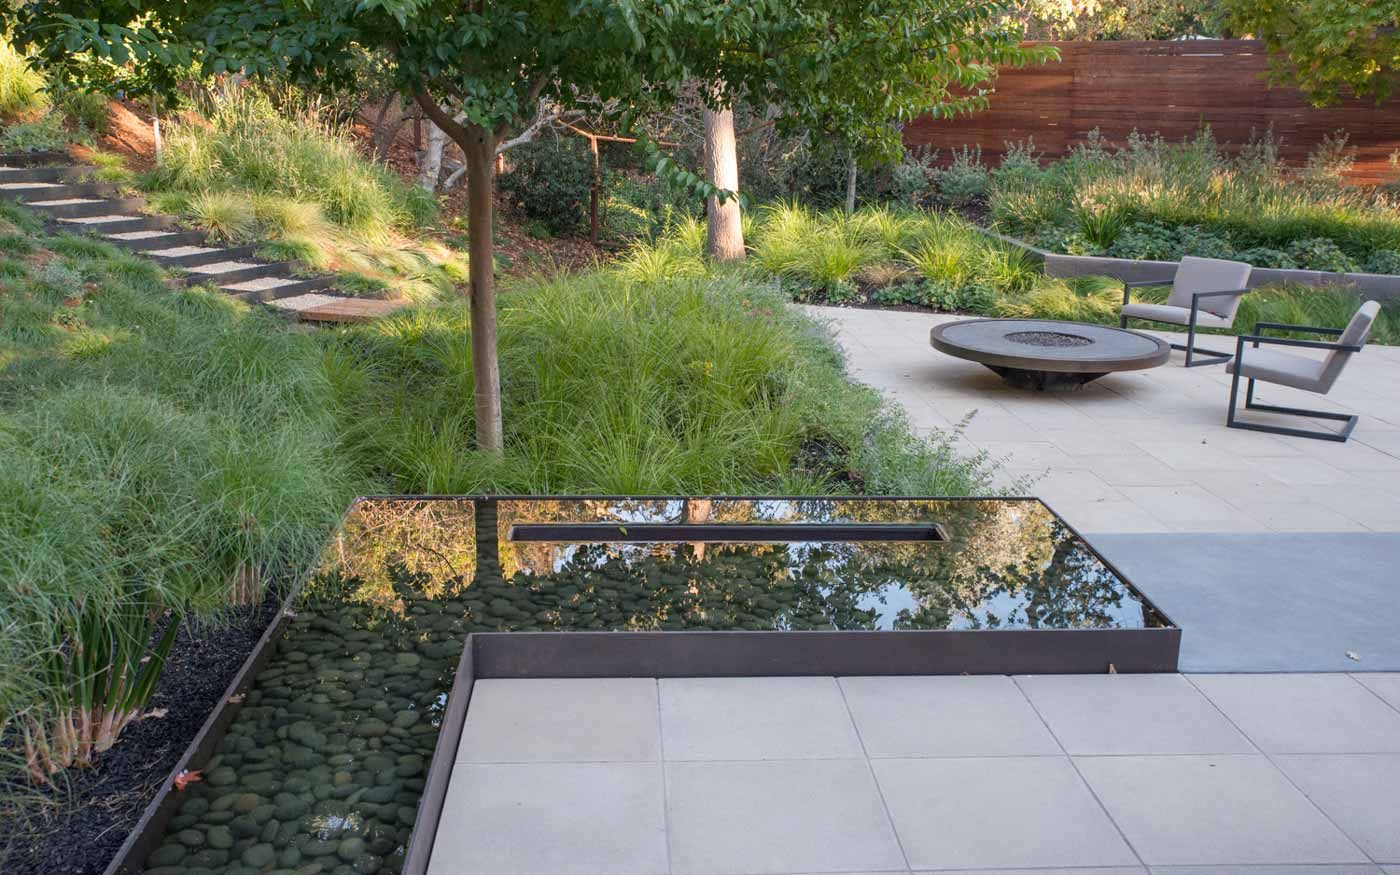 Water feature in la fayette ca designed by thuilot for Landscape design associates